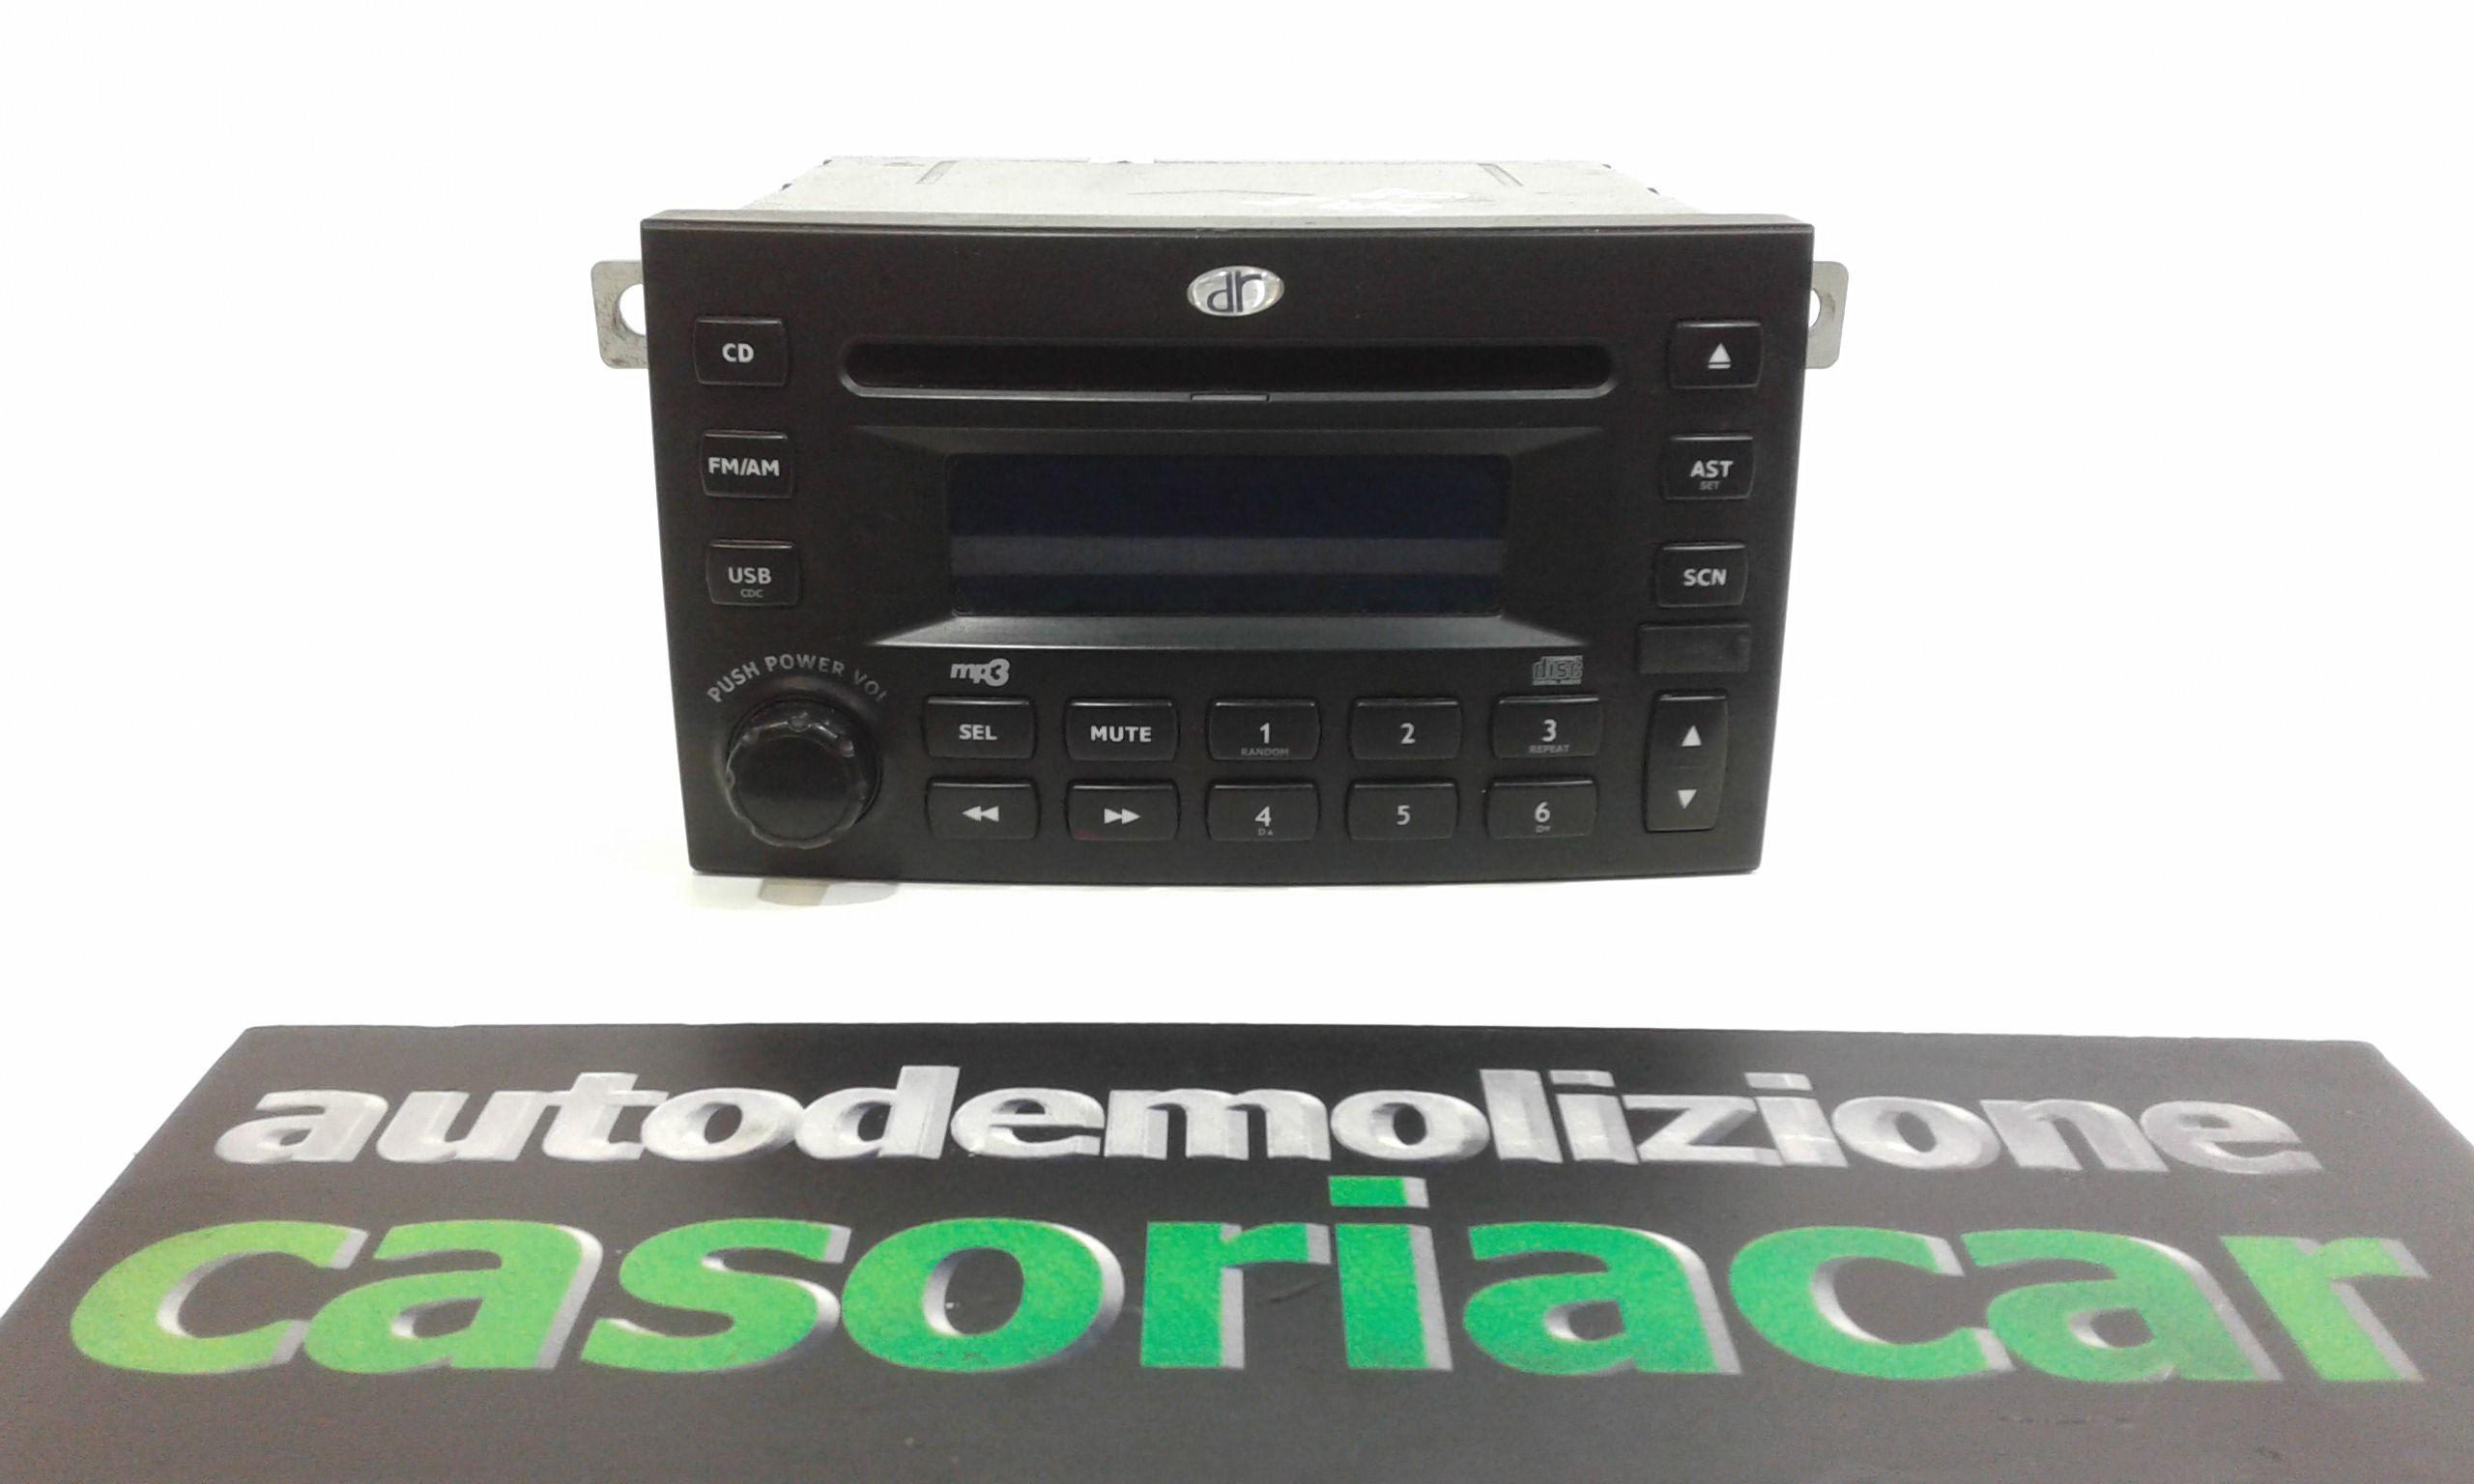 AUTORADIO MP3 DR 5 1° Serie 1600 Benzina  (2007) RICAMBI USATI